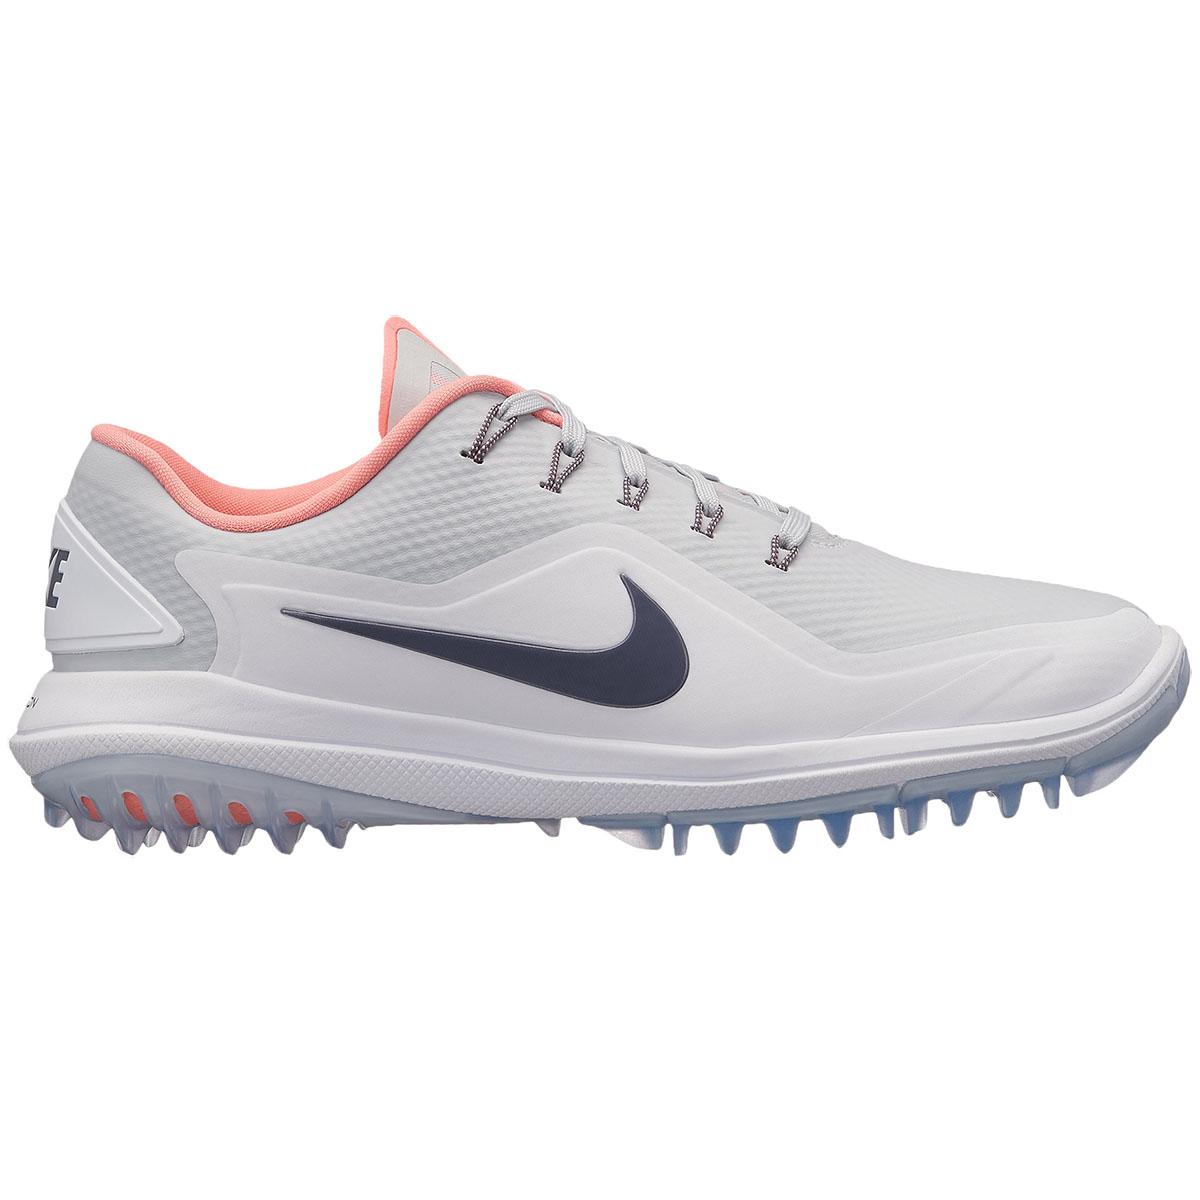 b099220e1899 Nike Golf Ladies Lunar Control Vapor 2 Shoes